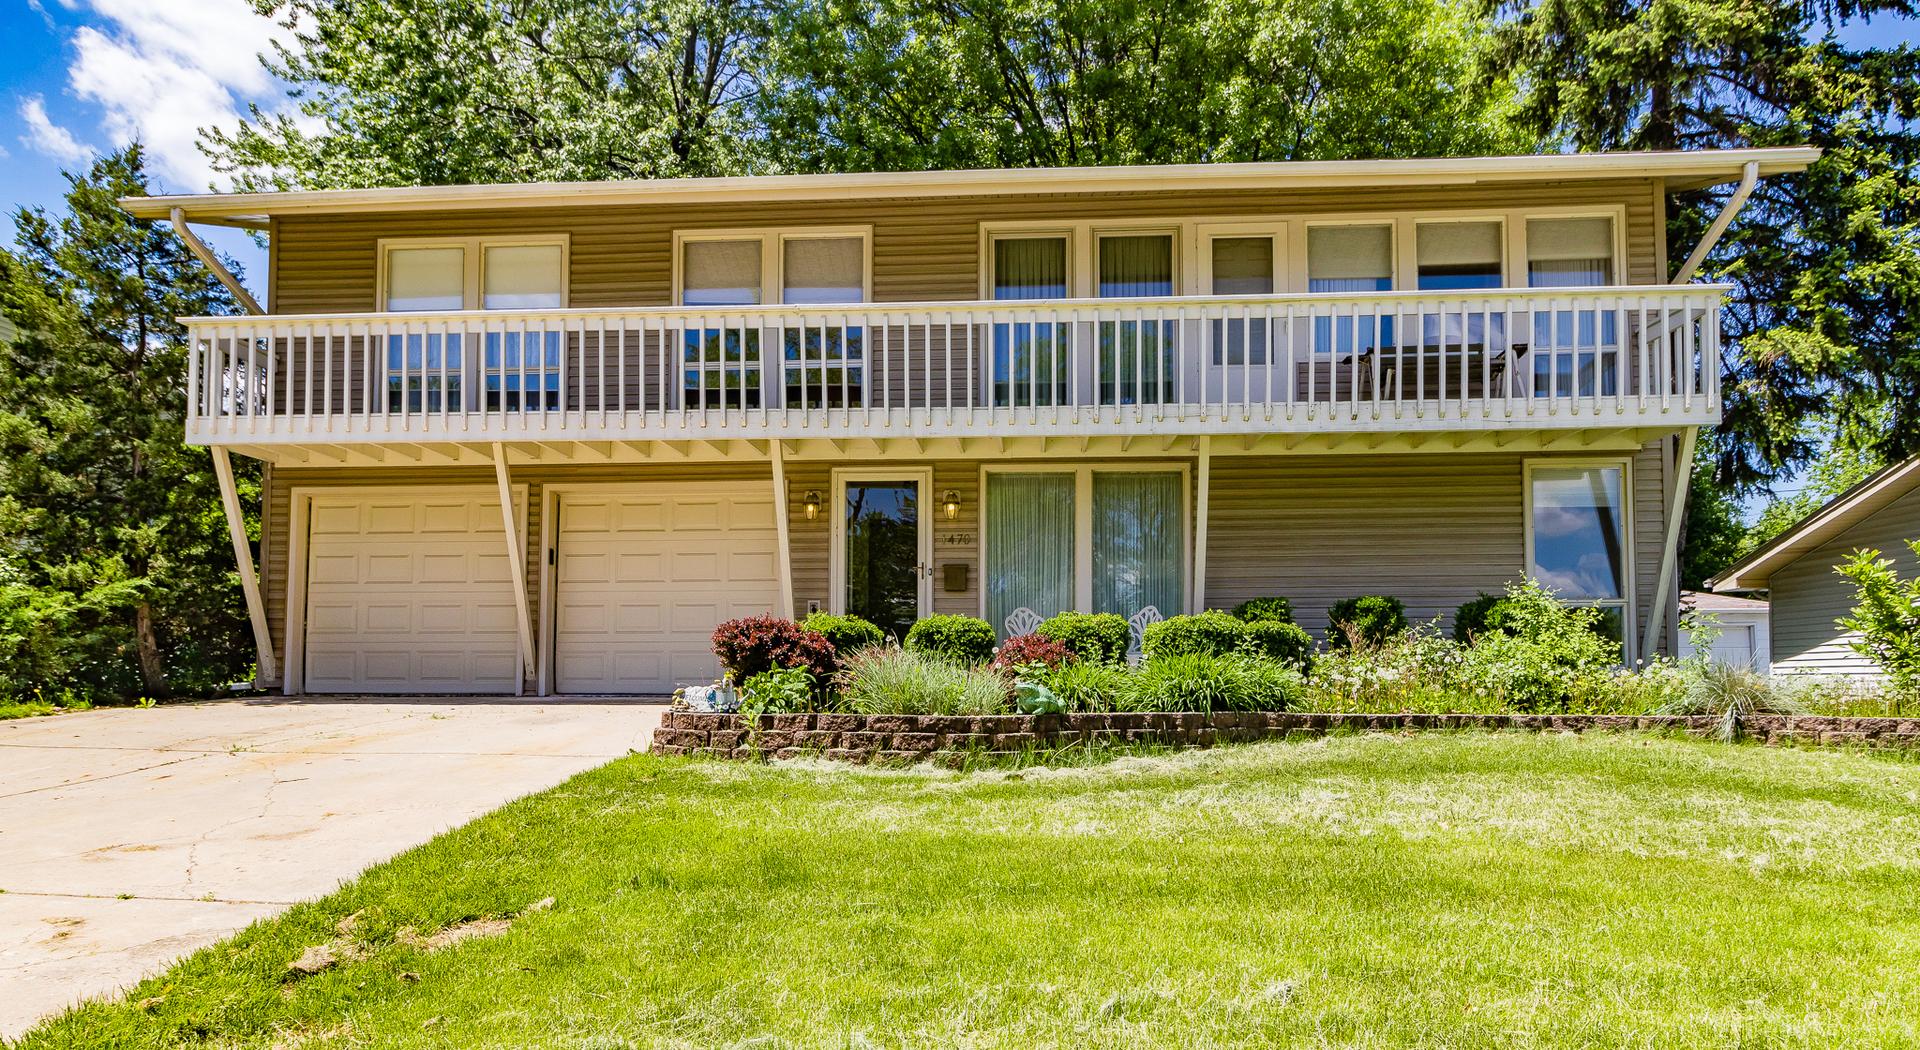 1470 Dennison ,Hoffman Estates, Illinois 60169